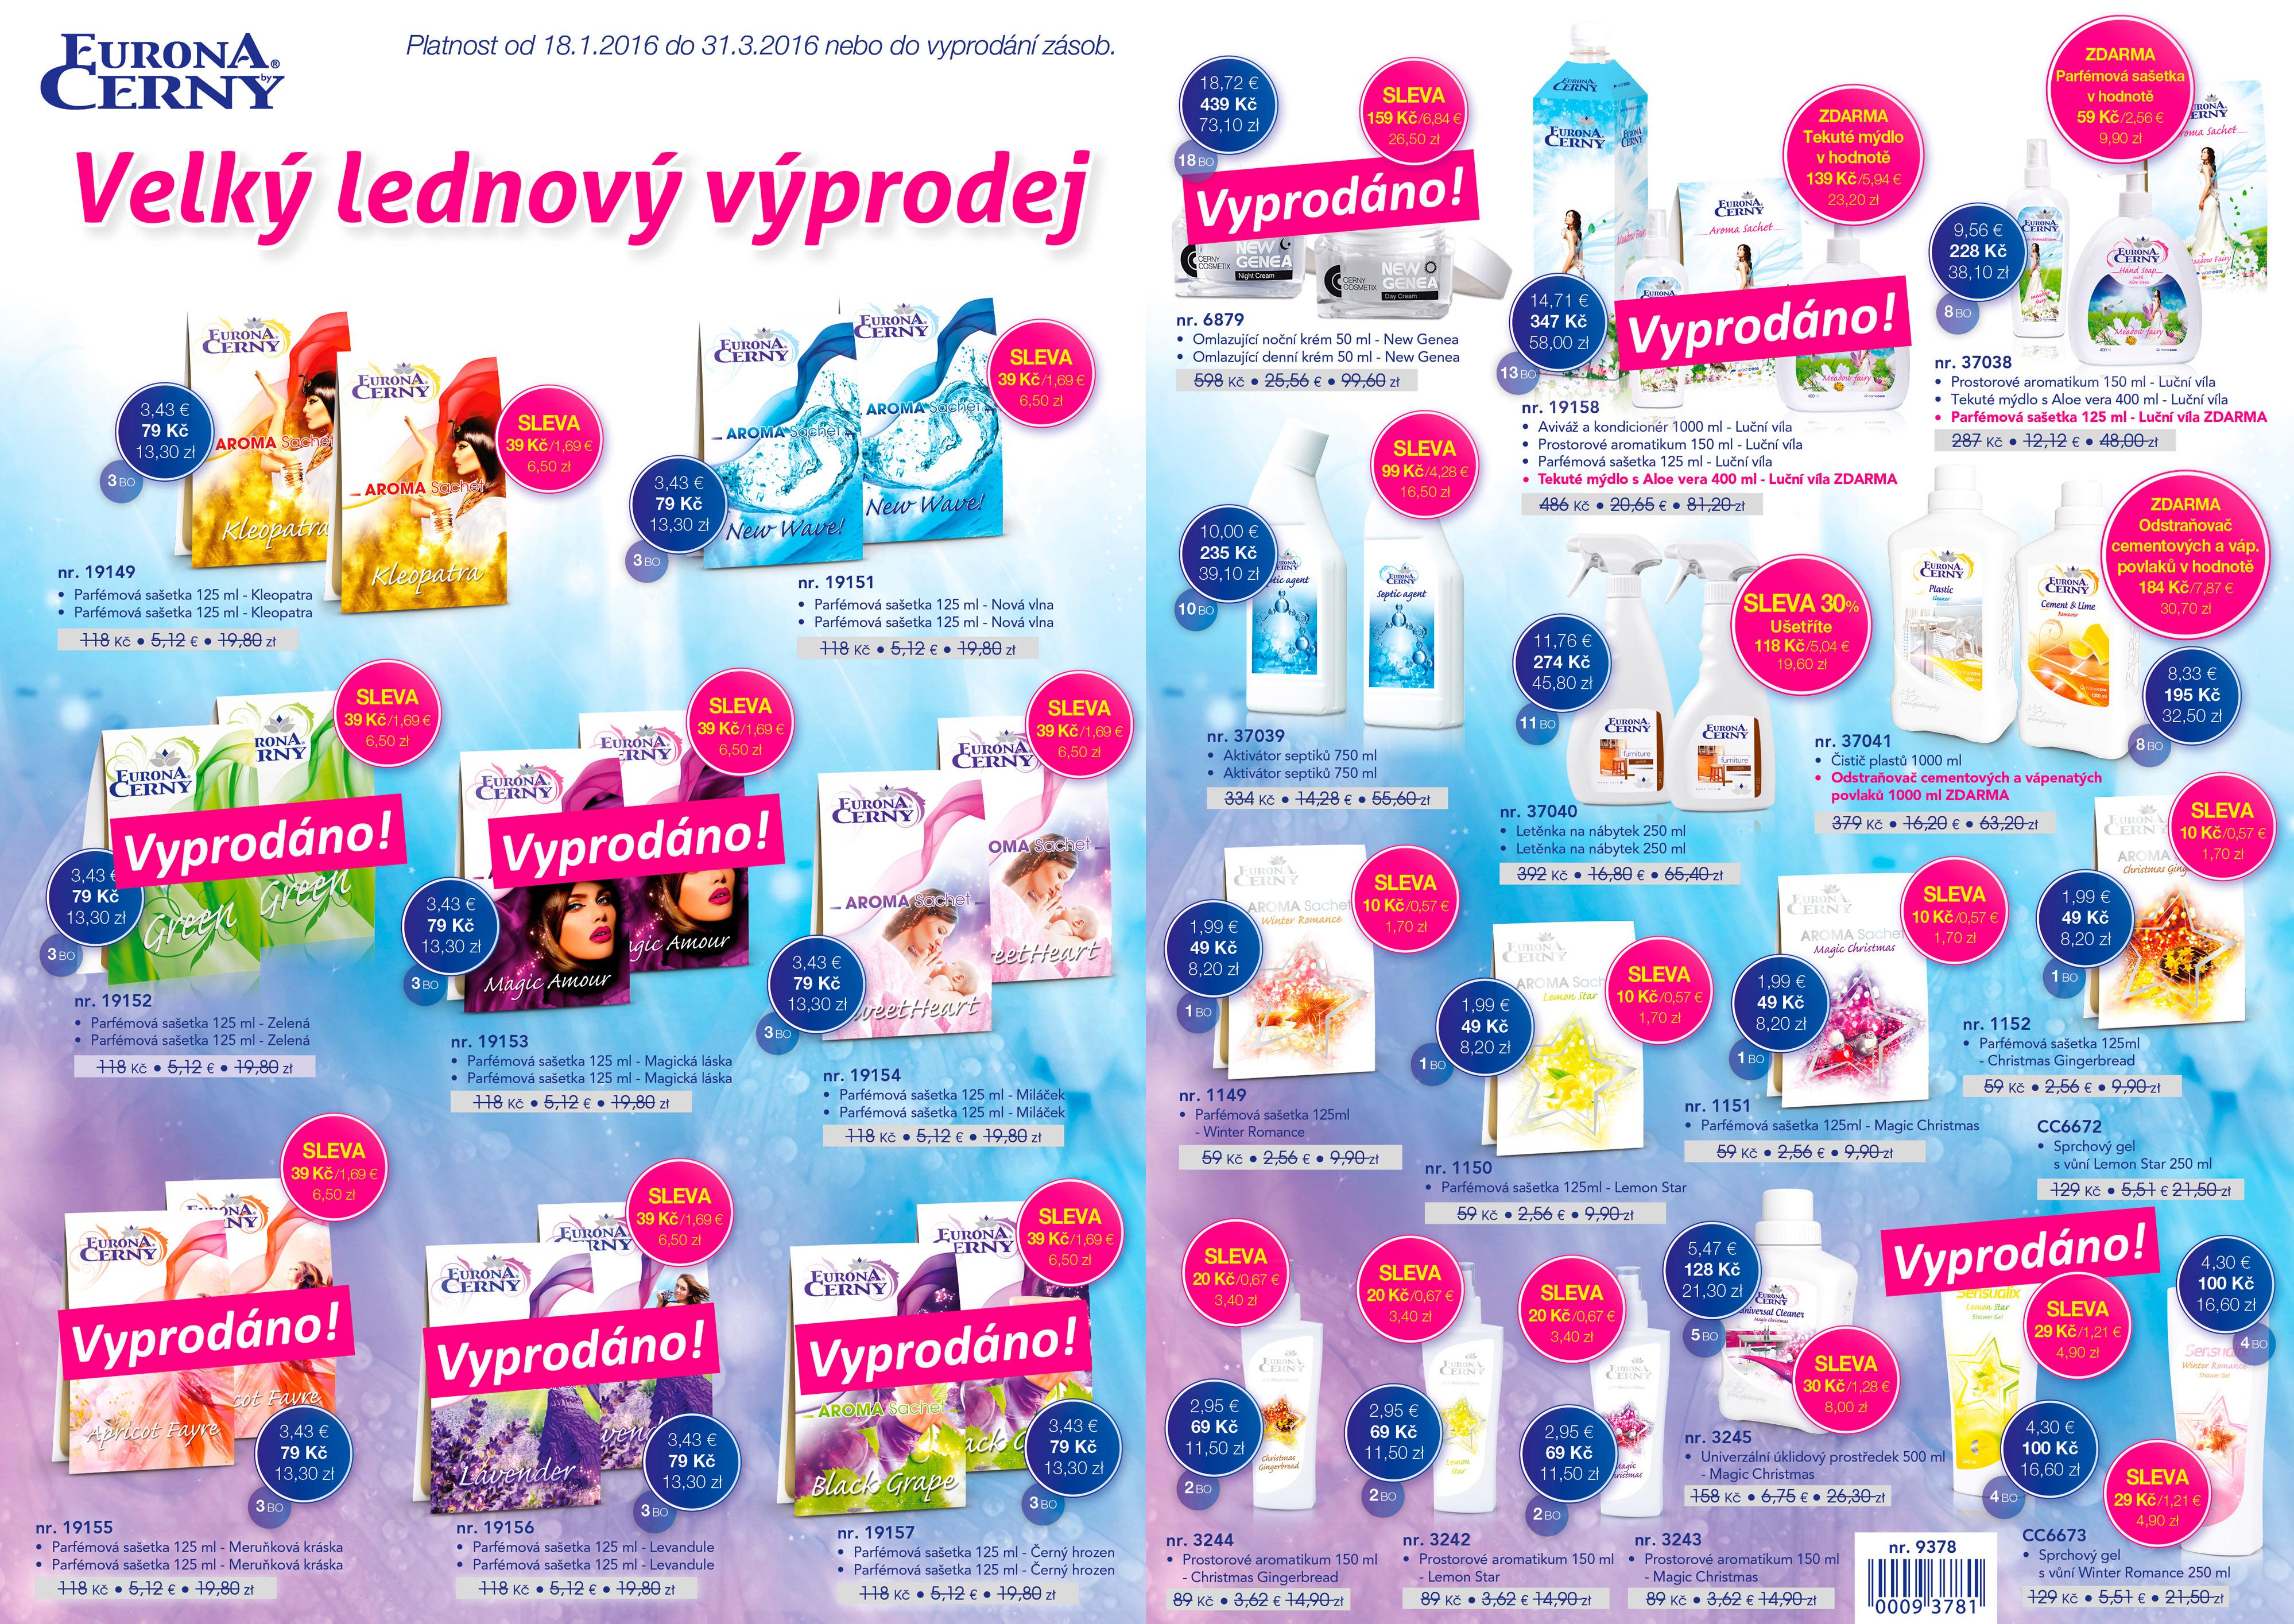 http://kosmetika-drogerie.deni.cz/eurona2016/vyprodej16.jpg